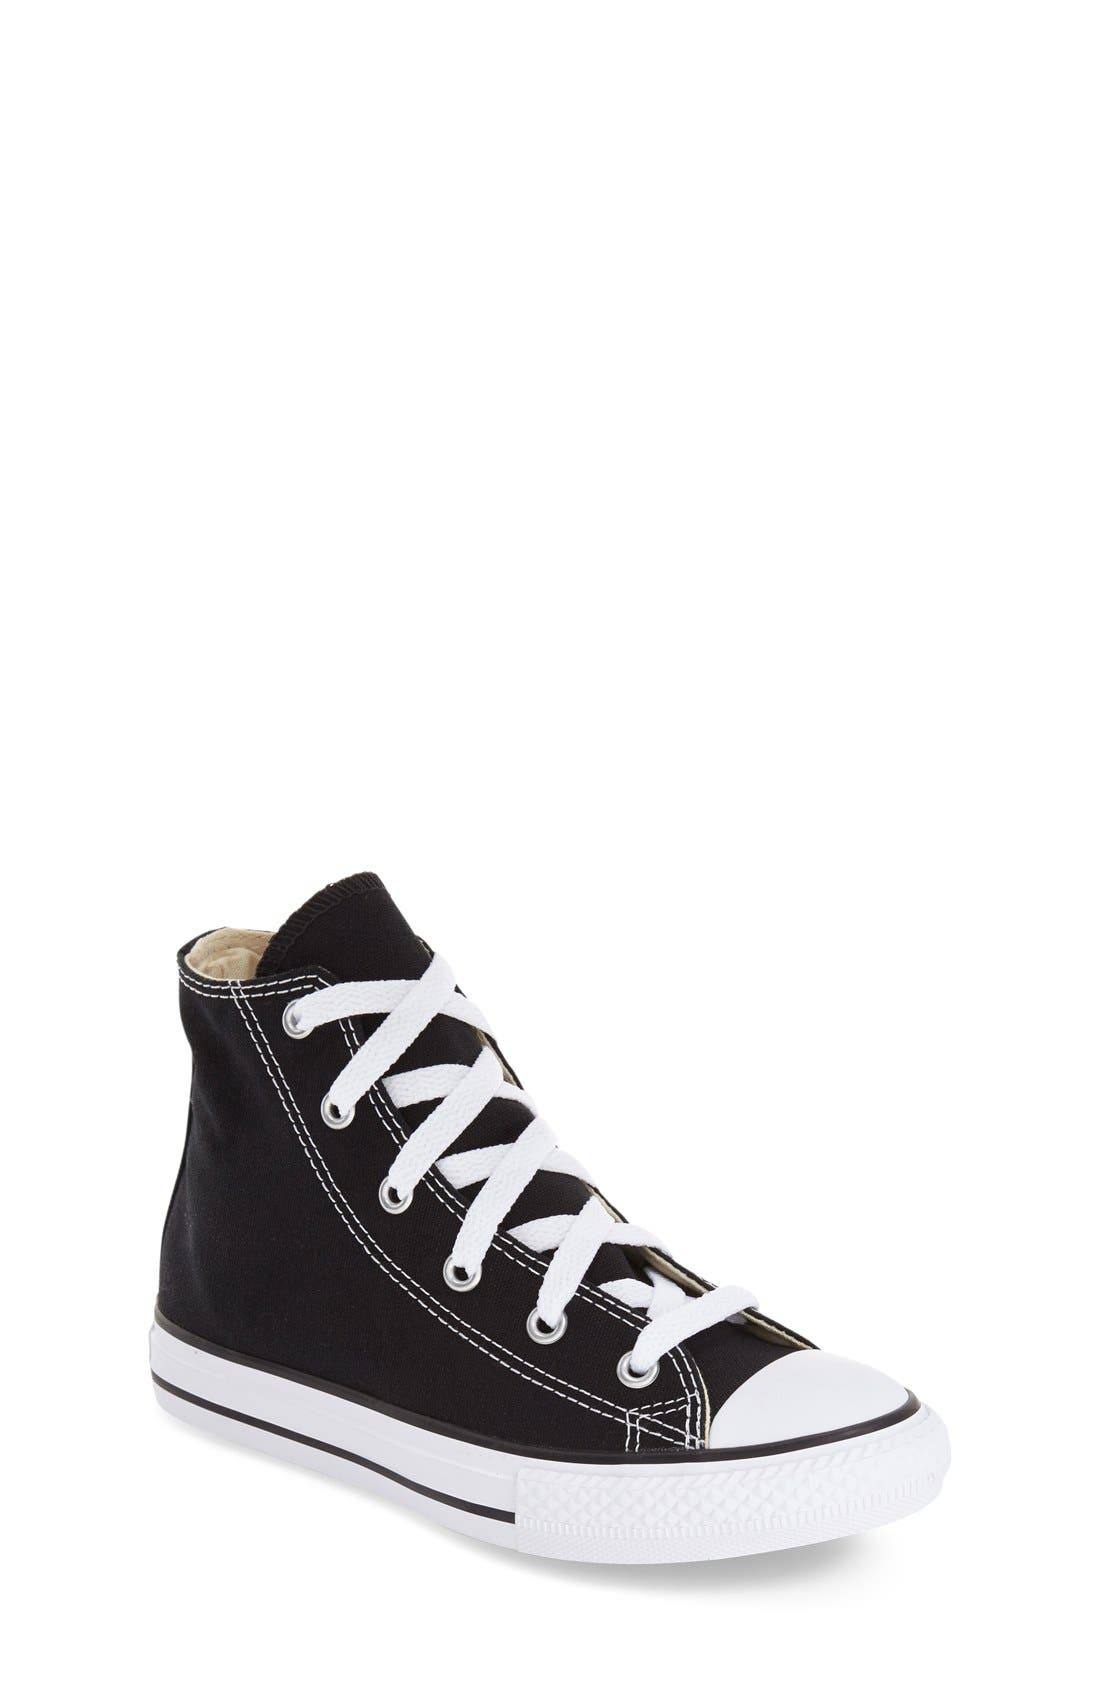 Chuck Taylor<sup>®</sup> High Top Sneaker,                             Main thumbnail 1, color,                             Black